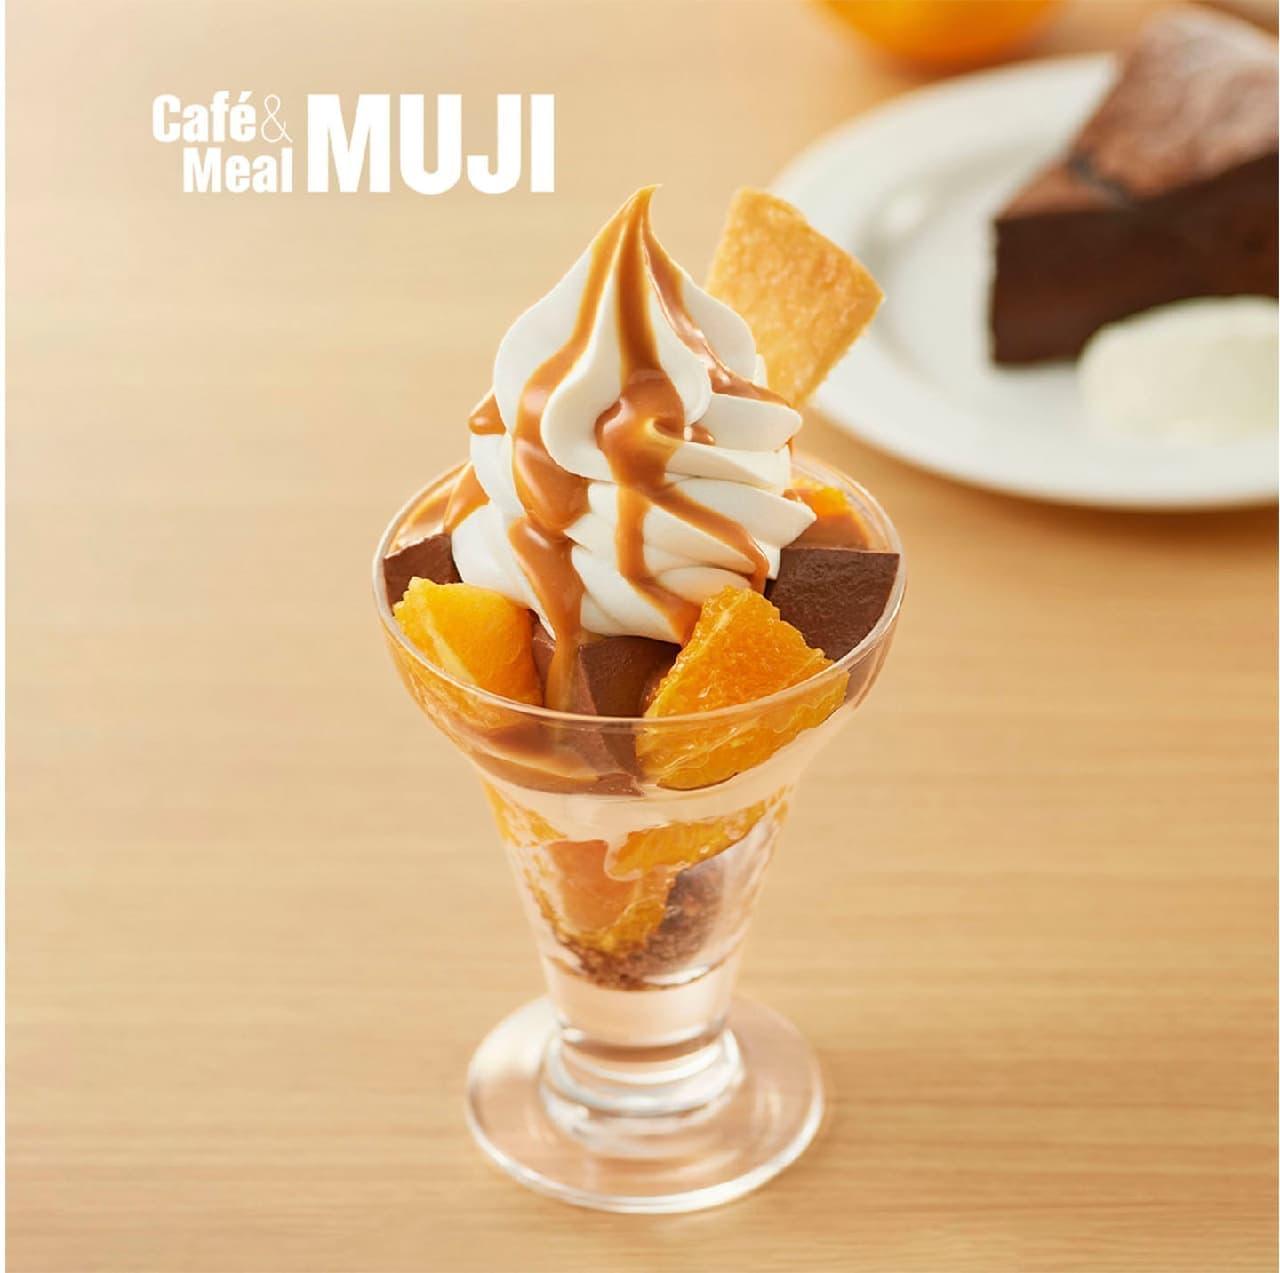 Cafe & Meal MUJI 季節限定「ガトーショコラ」